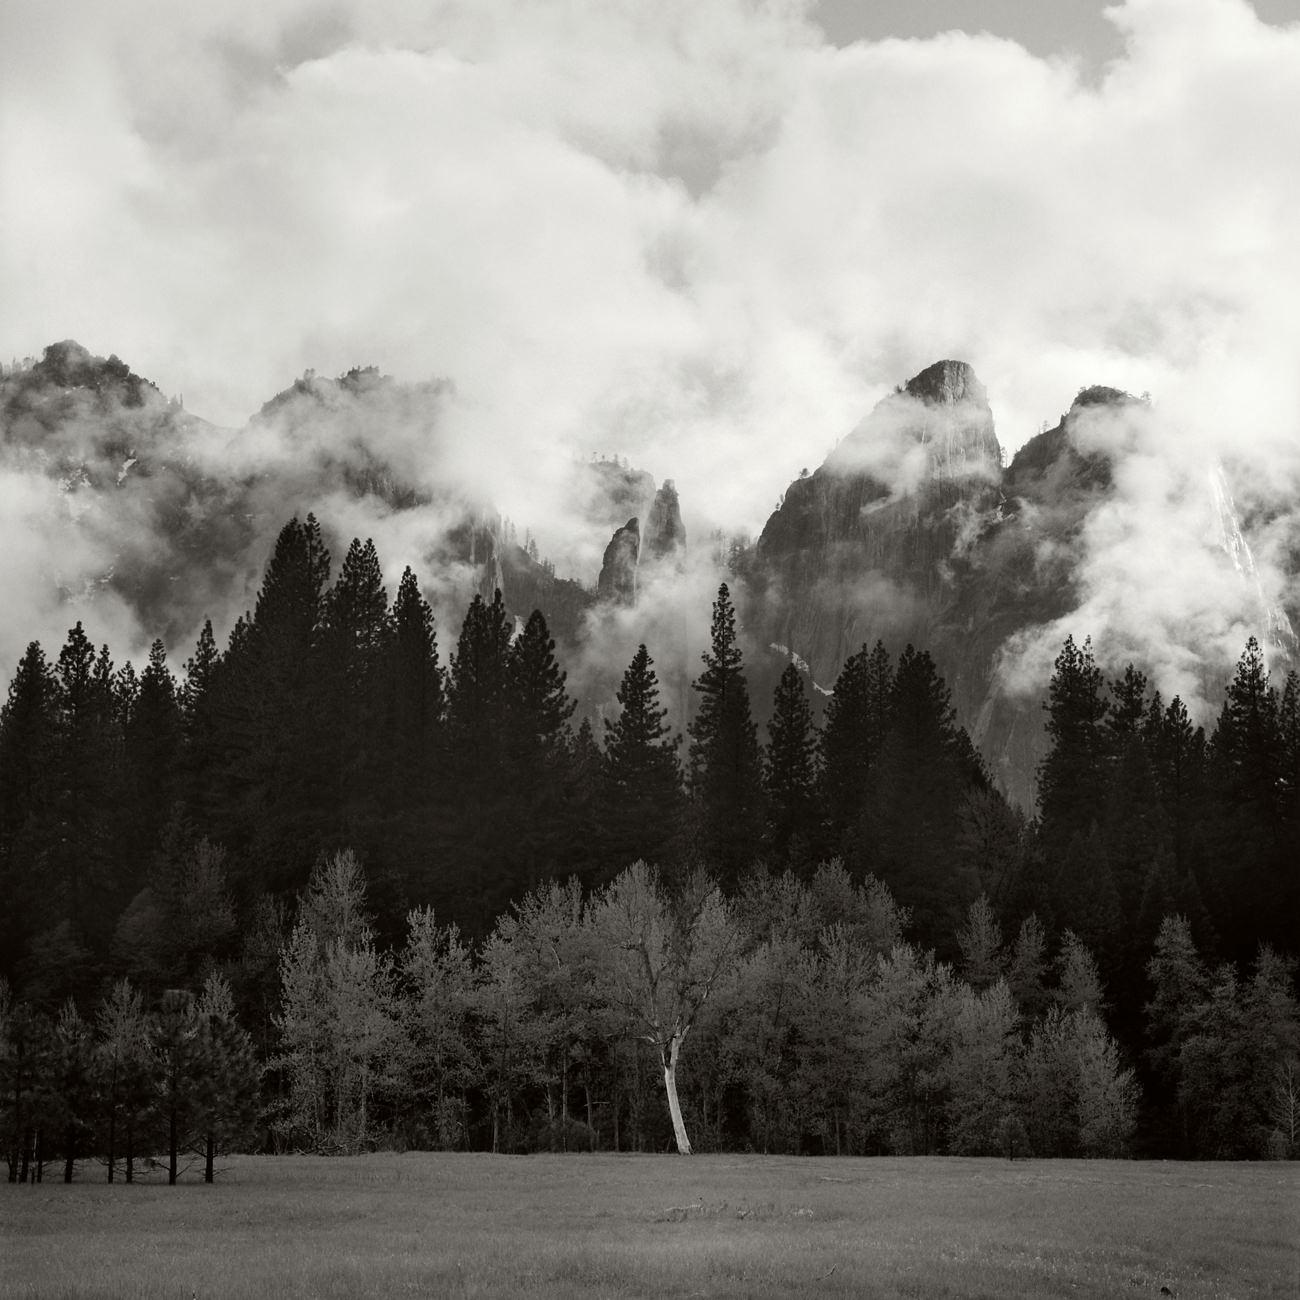 Yosemite_Valley_011.jpg